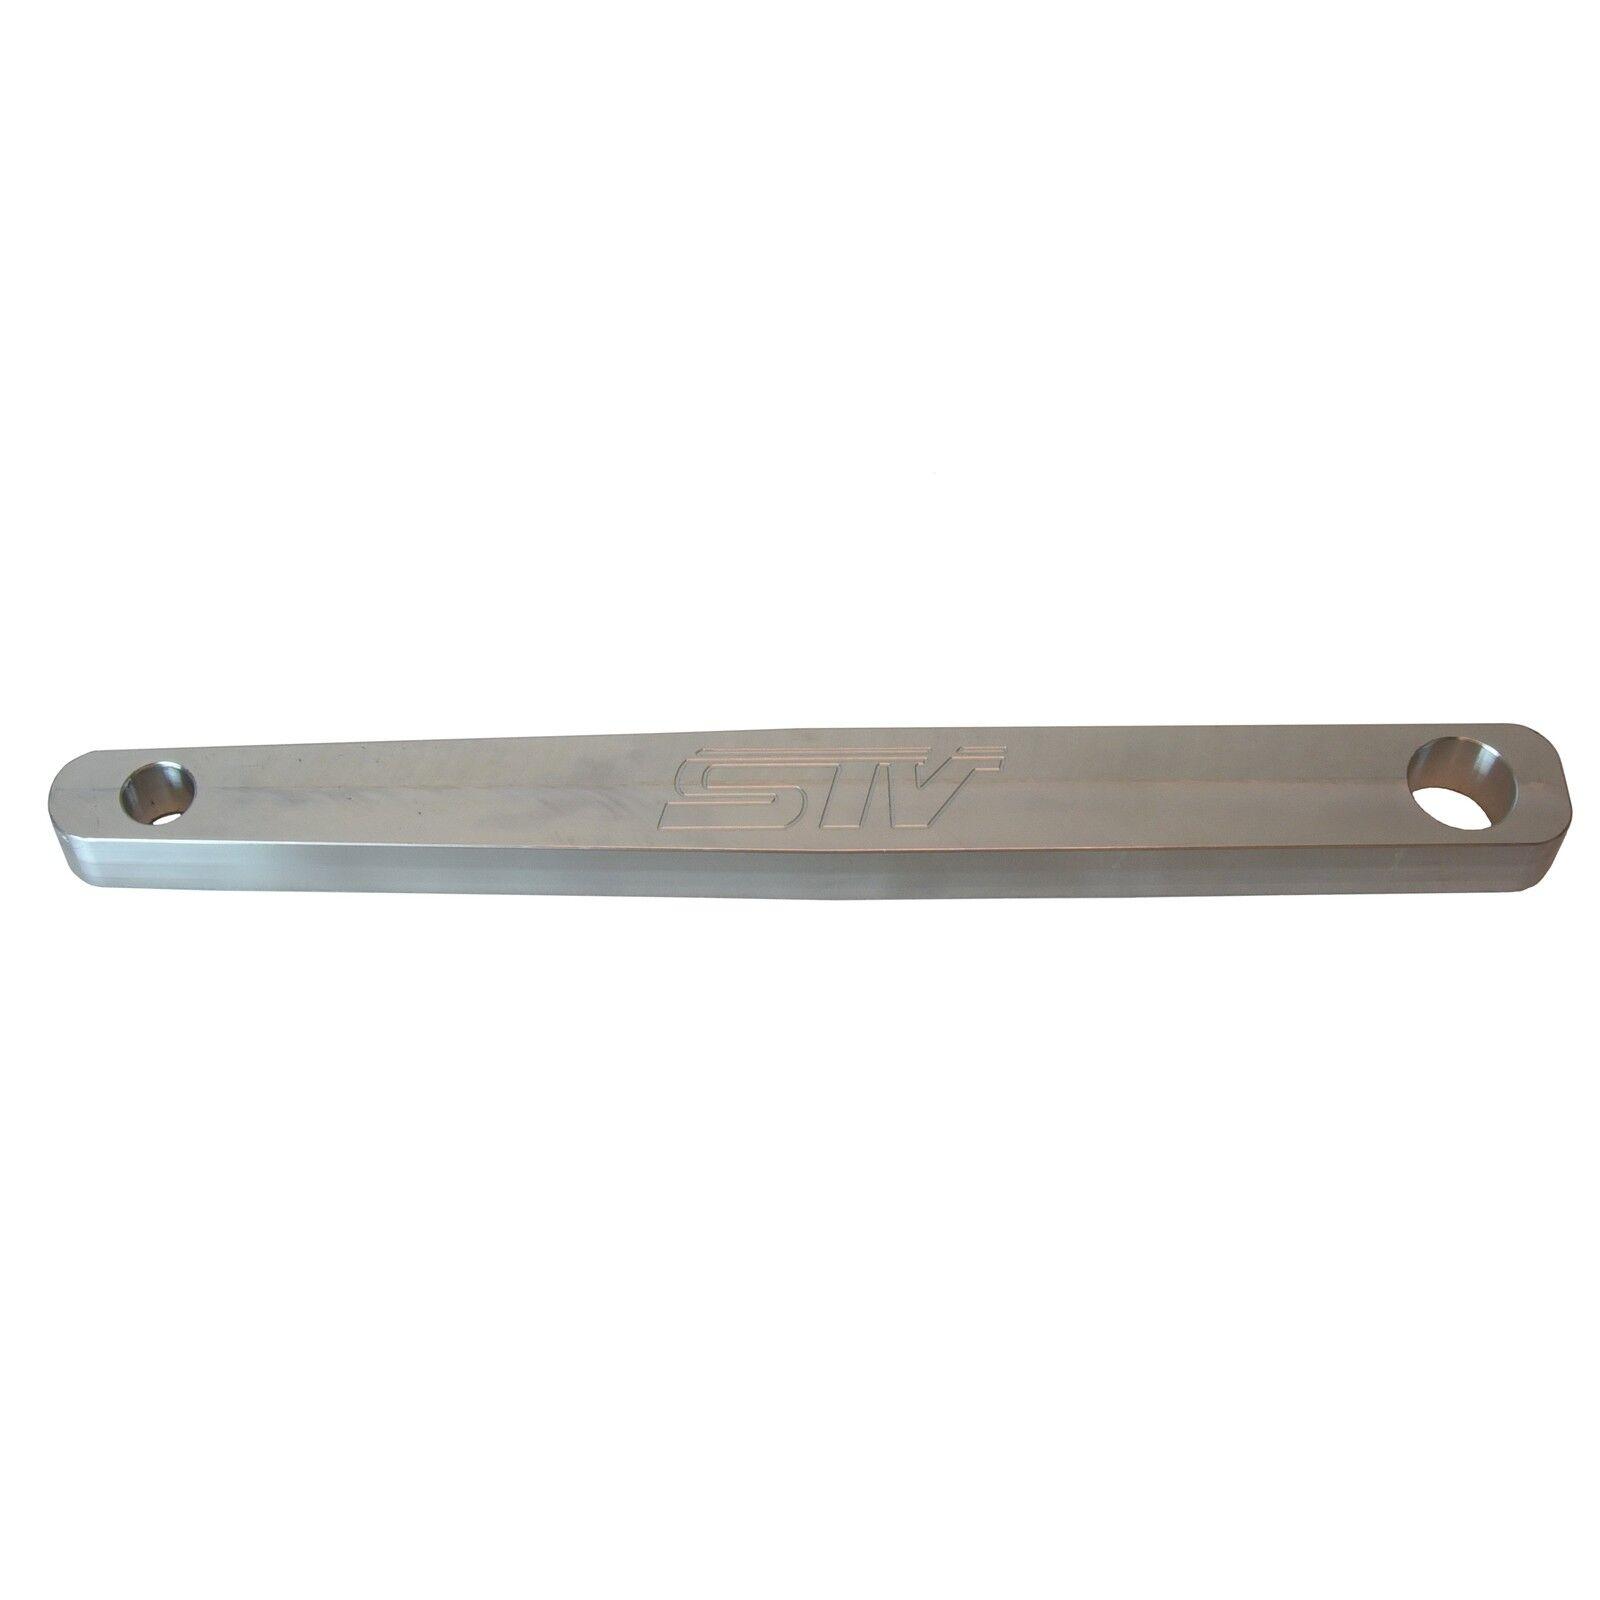 polaris clutch alignment tool polaris rzr xp 1000 xp 900